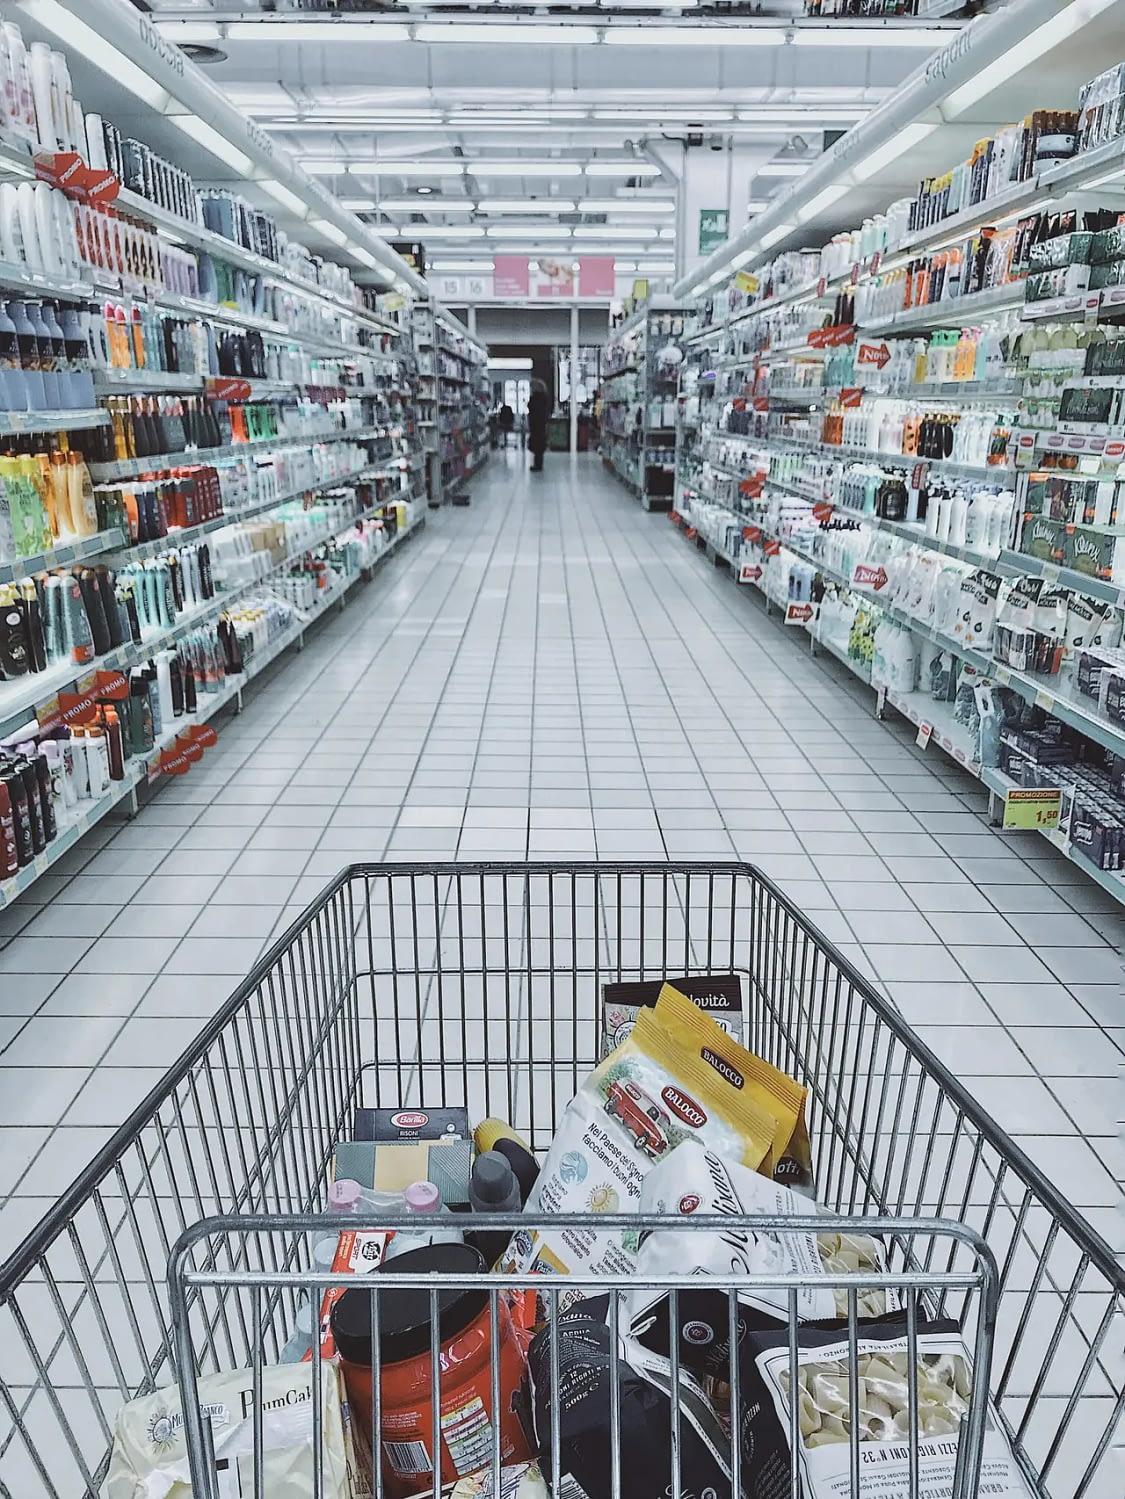 Inside Walmart's $50 Billion Buy American Campaign